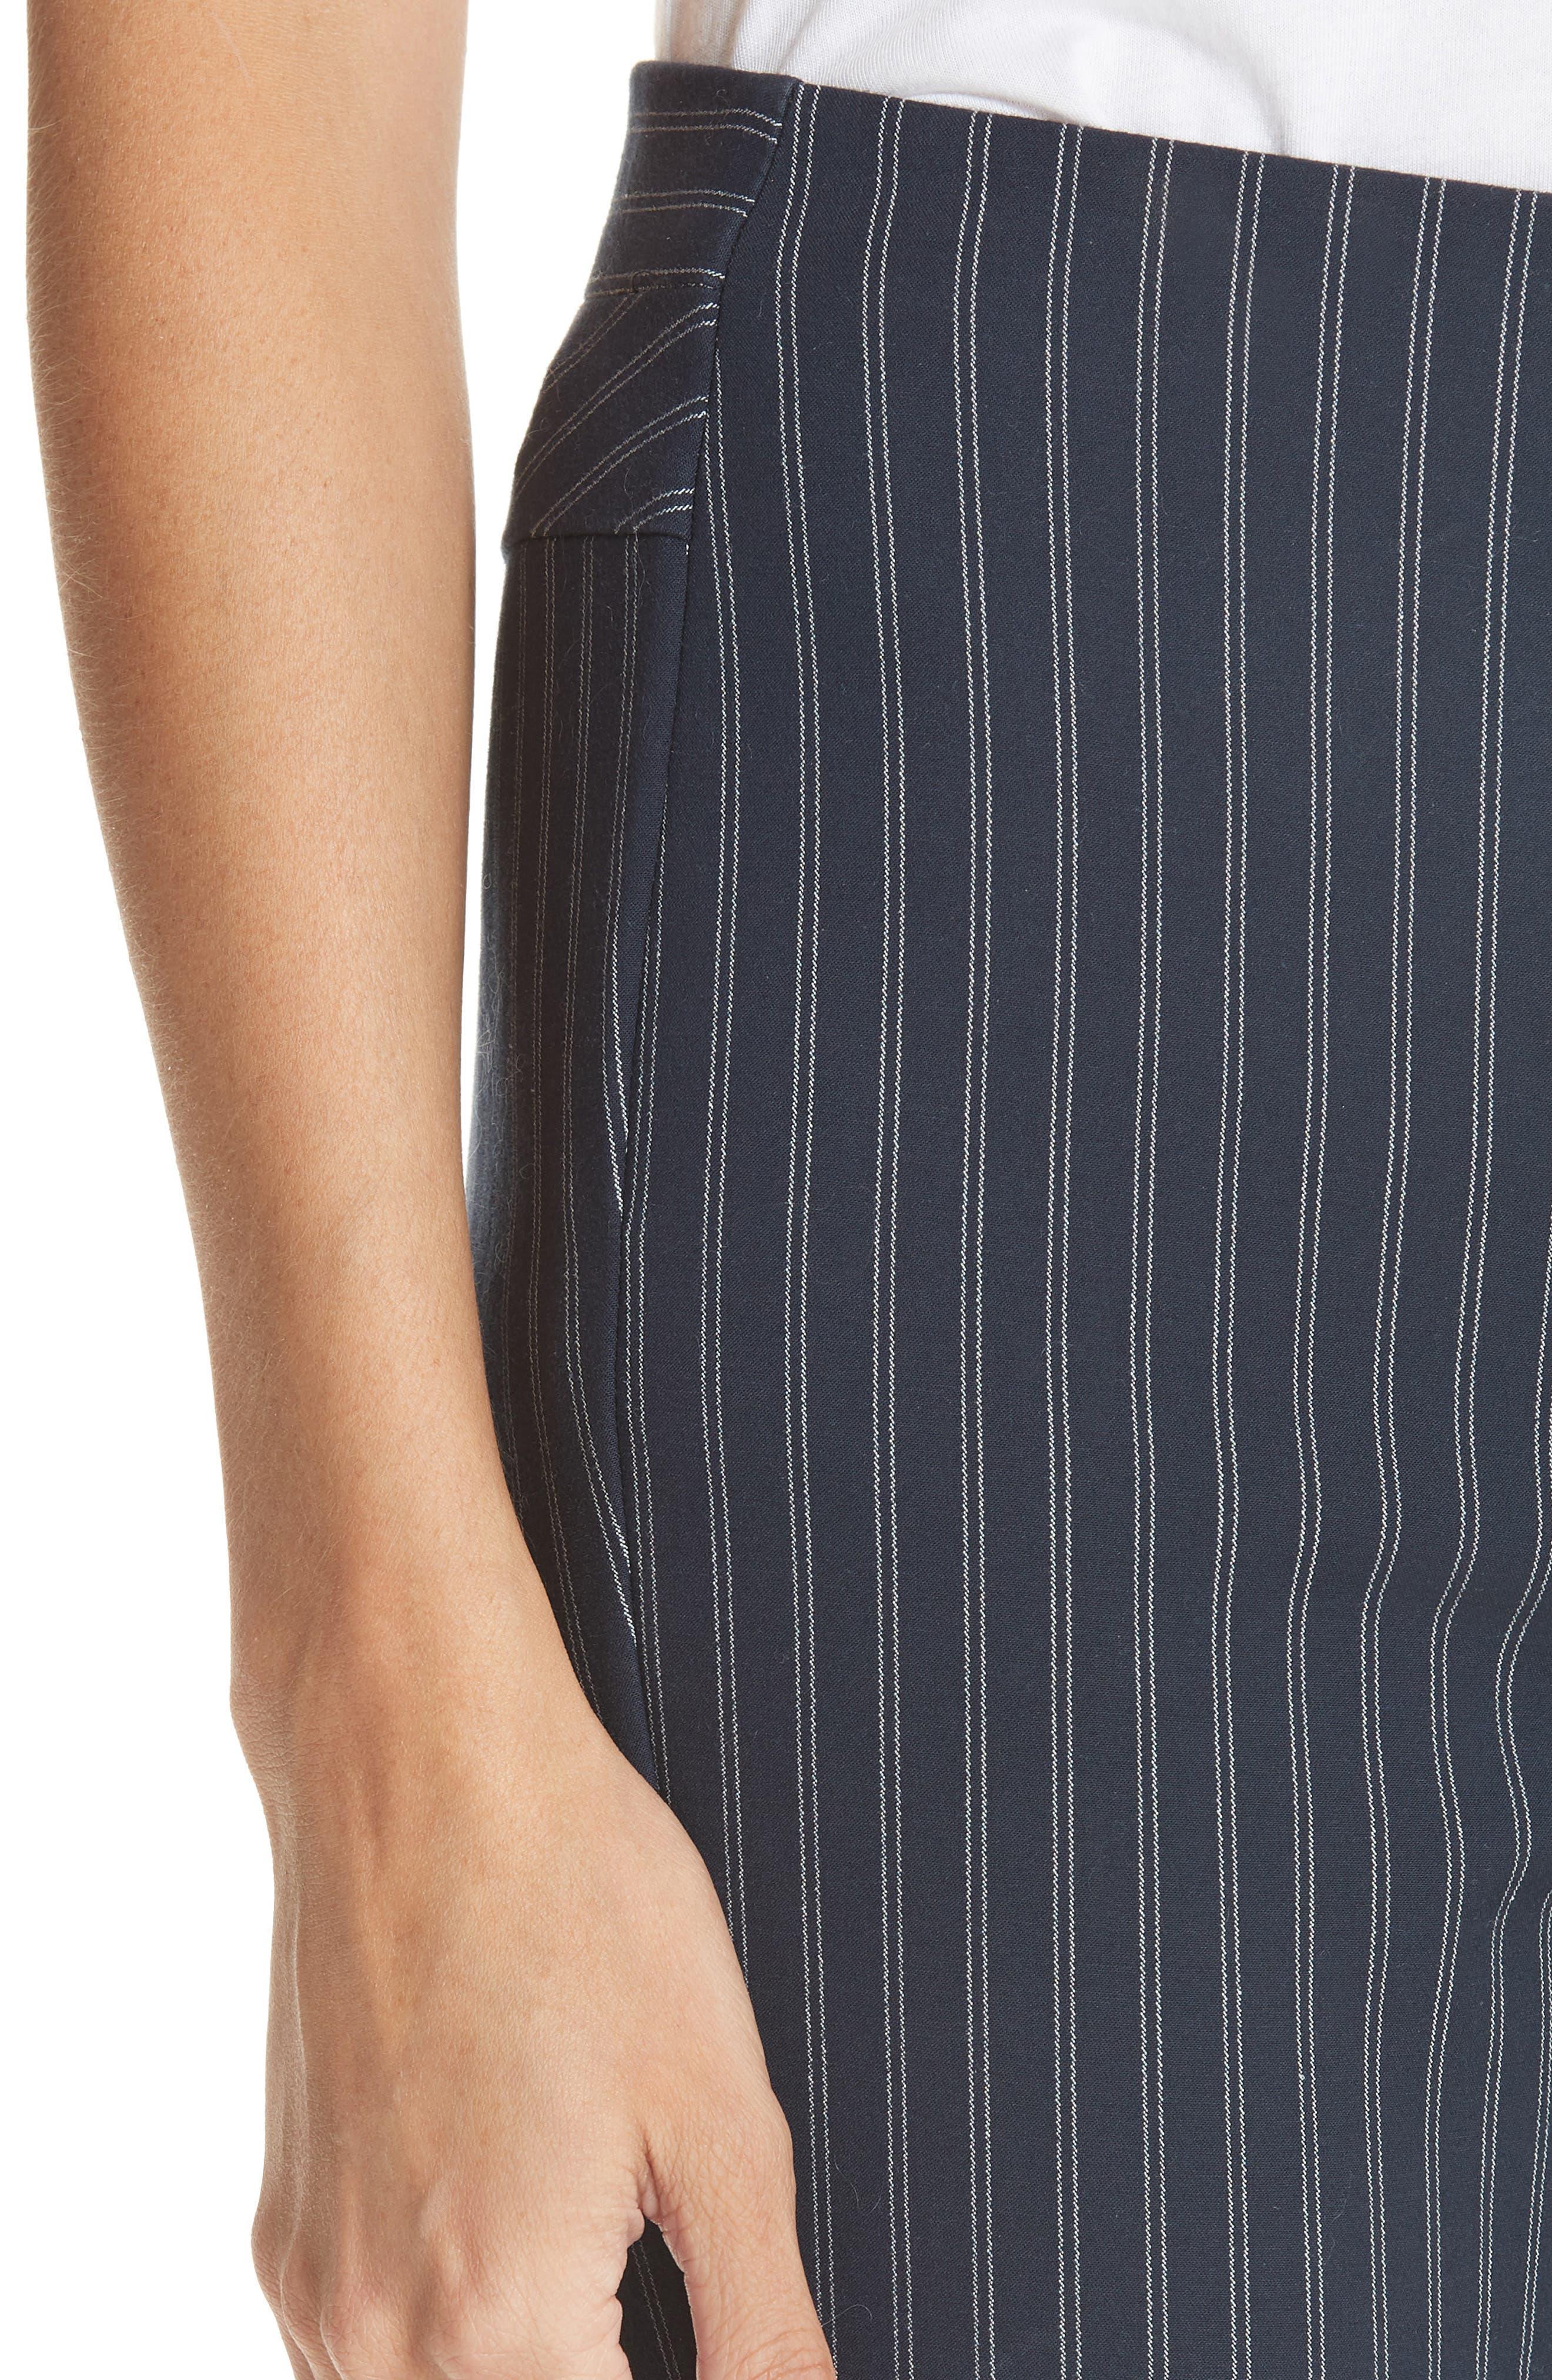 Simone Pinstripe Pants,                             Alternate thumbnail 5, color,                             Navy/ White